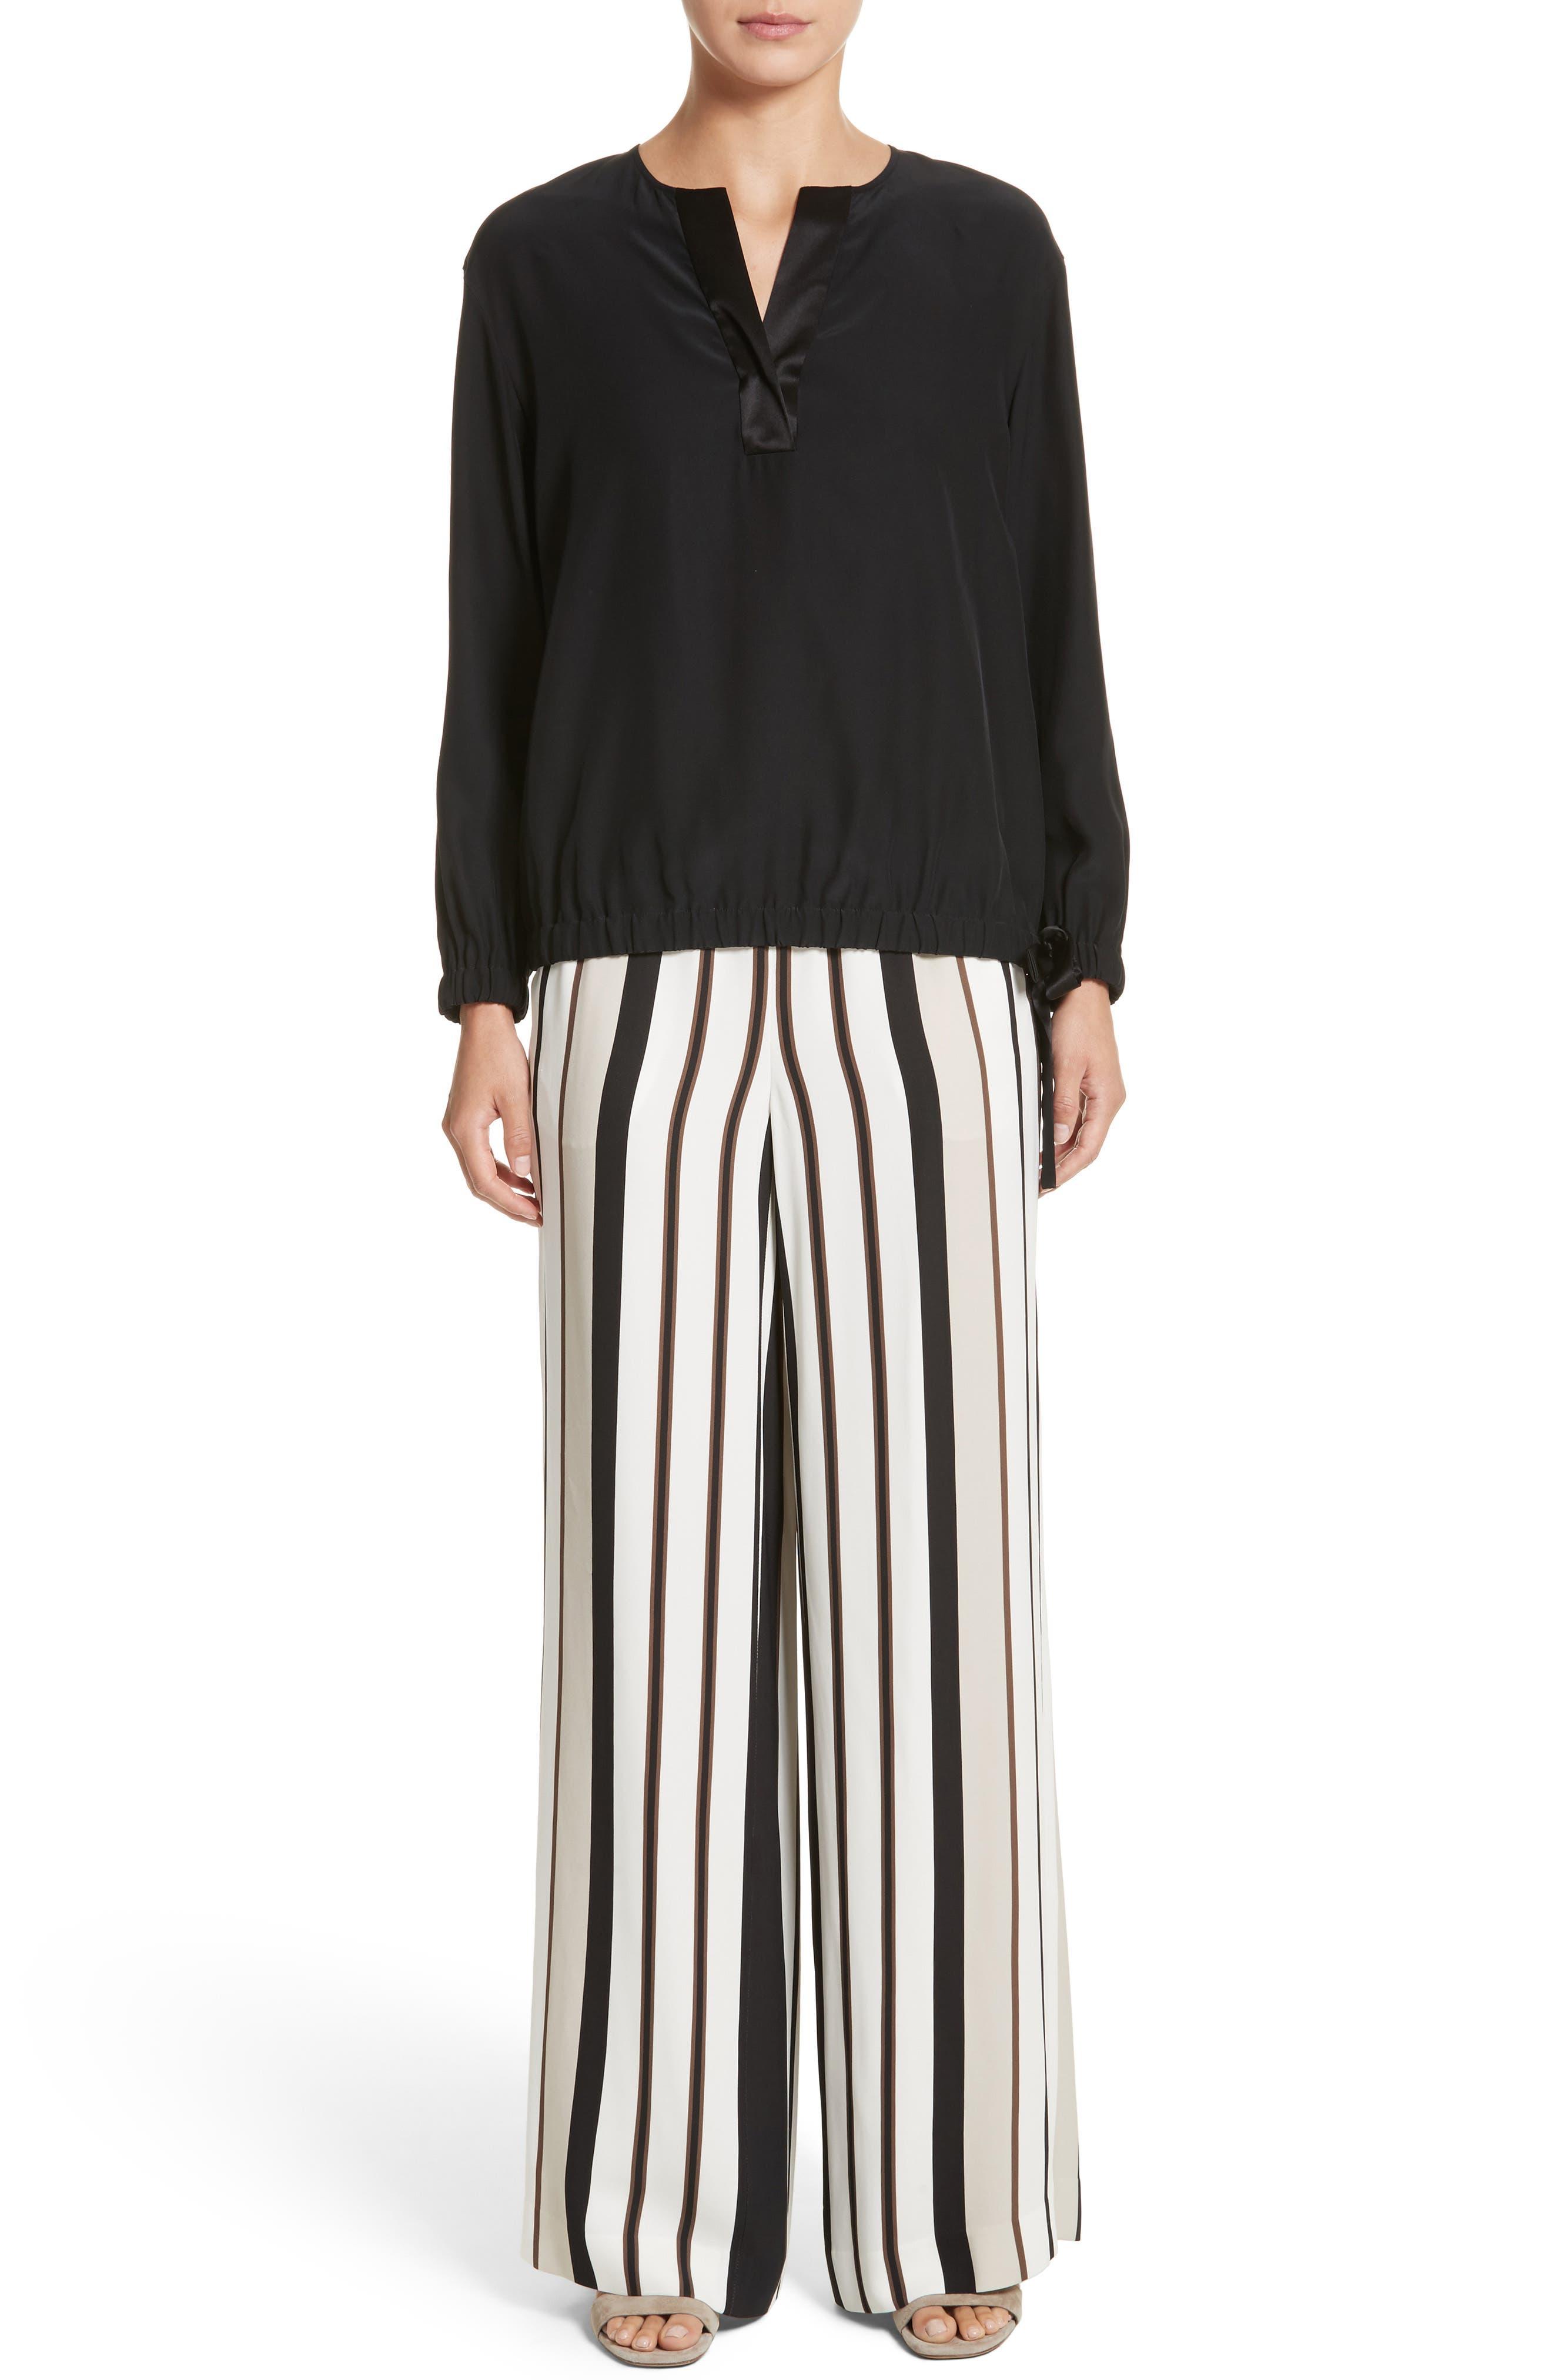 Allen Legacy Stripe Drape Cloth Pants,                             Alternate thumbnail 8, color,                             Black Multi